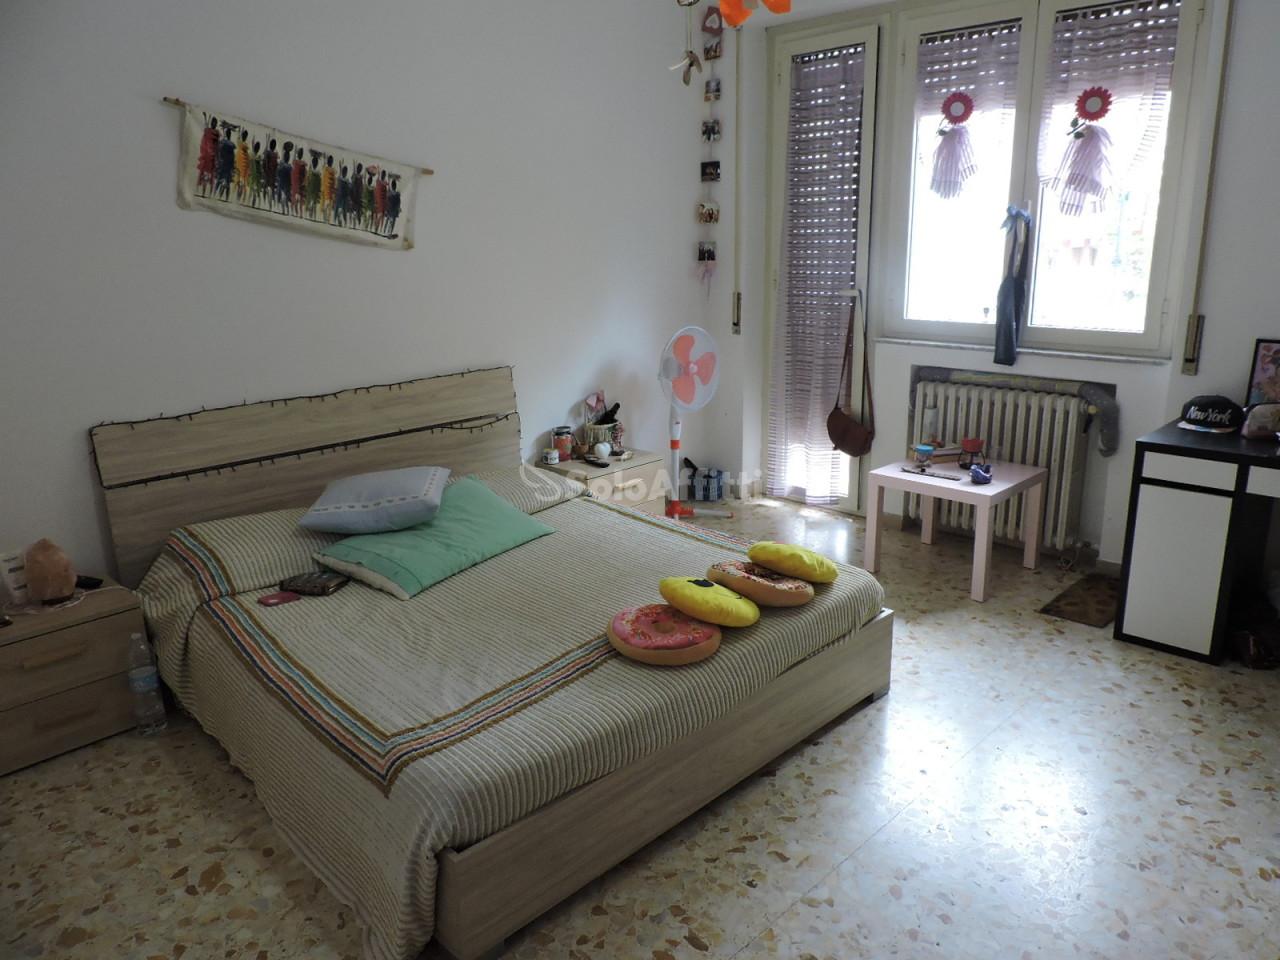 Appartamento - Quadrilocale a Stadio -  Pineta, Pescara